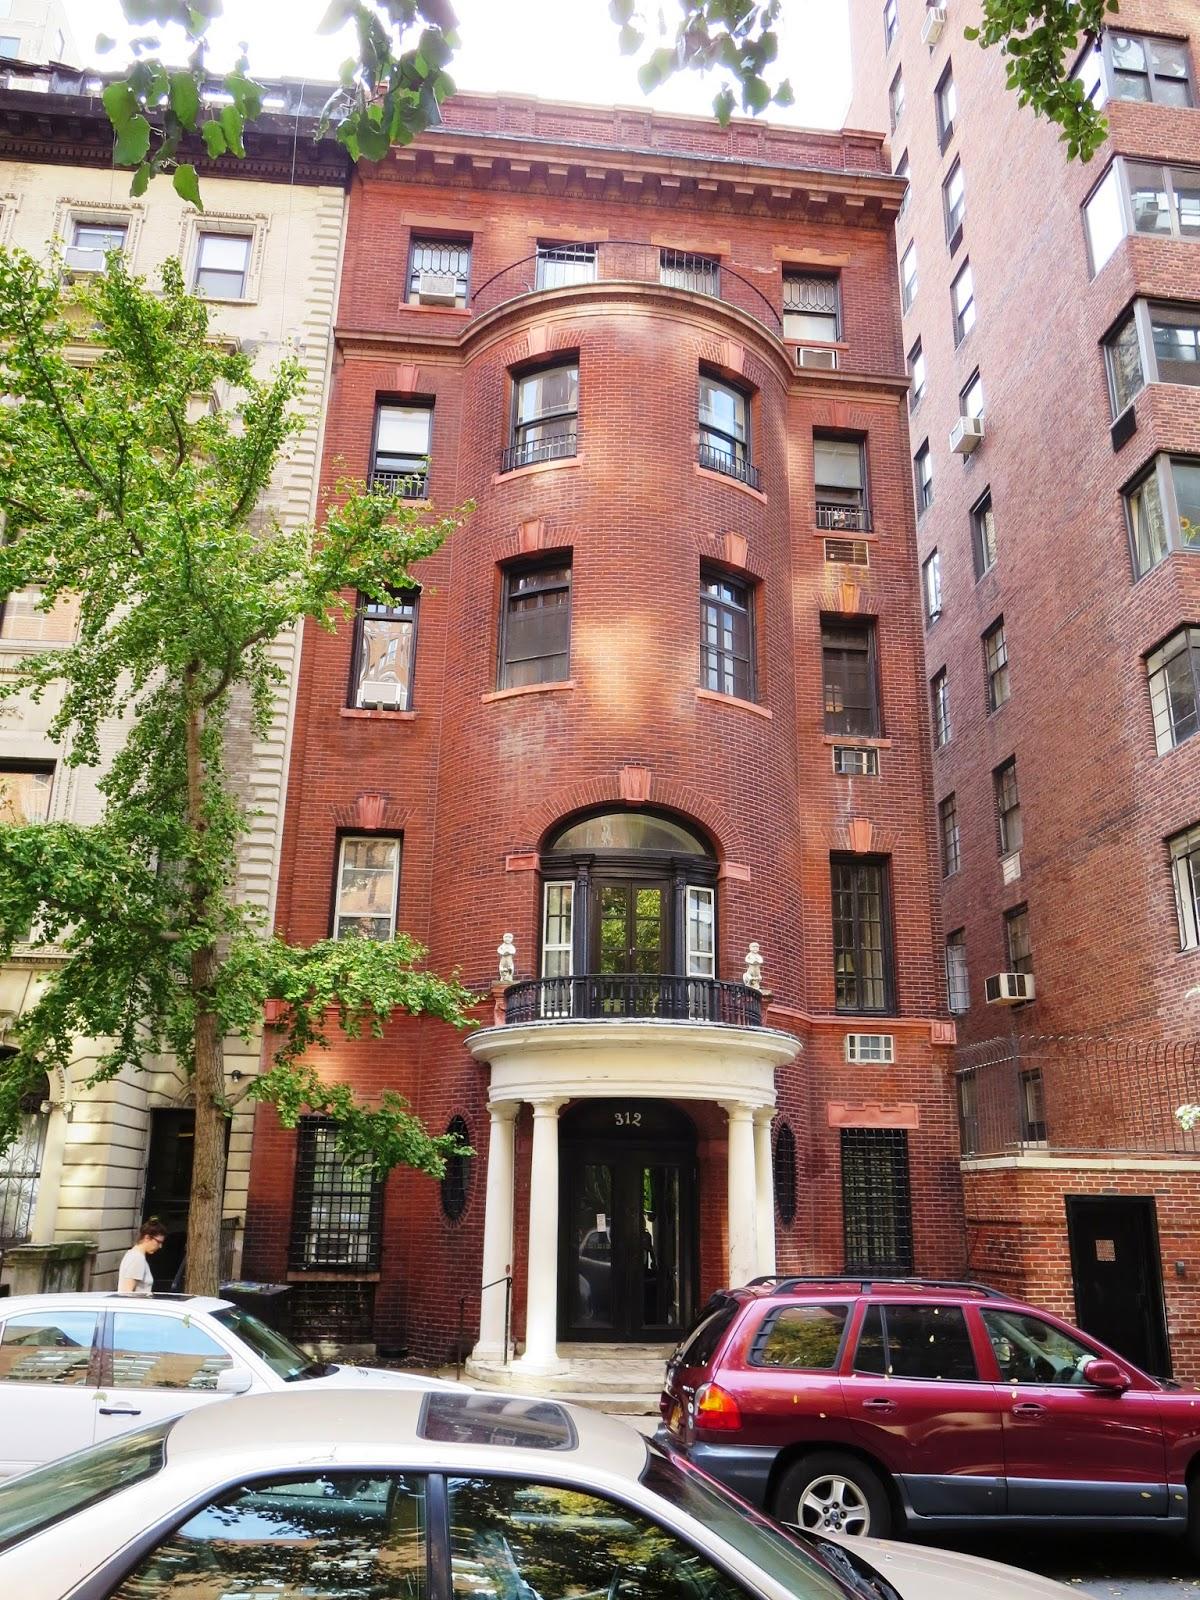 daytonian in manhattan c p h gilbert s 1898 no 312 west 73rd street